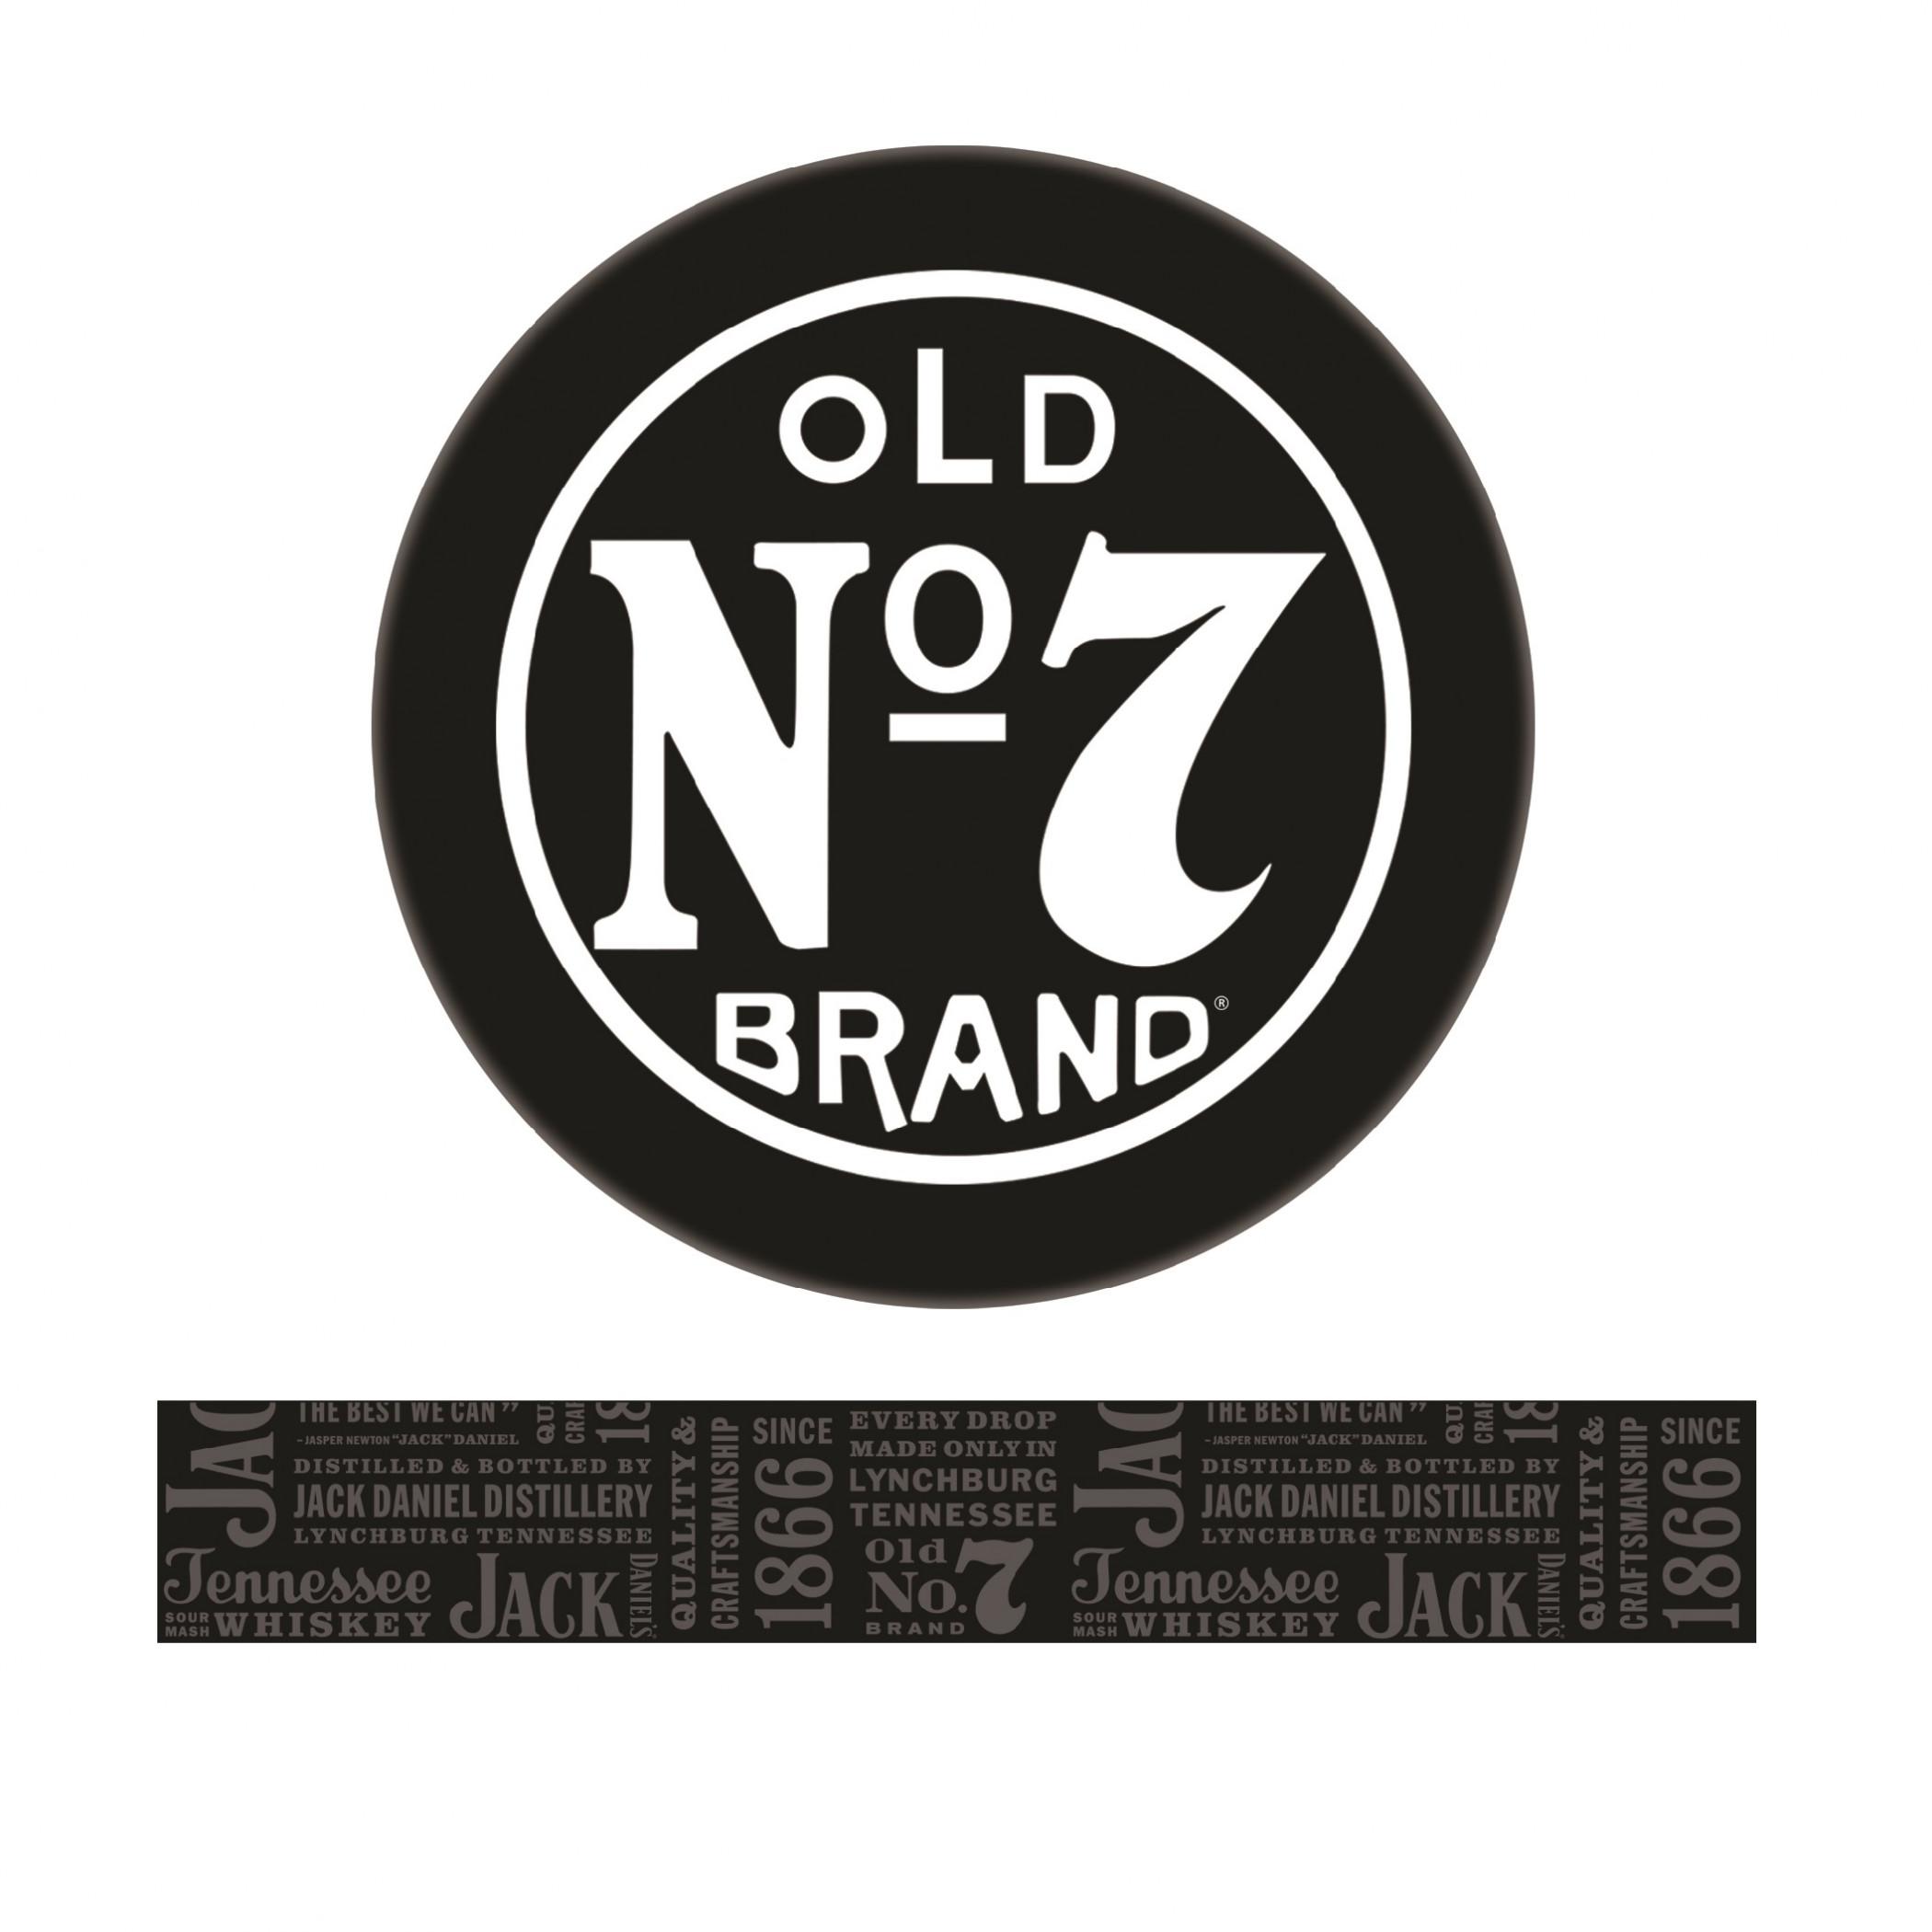 Jack Daniels Old No. 7 Brand Bar Stools